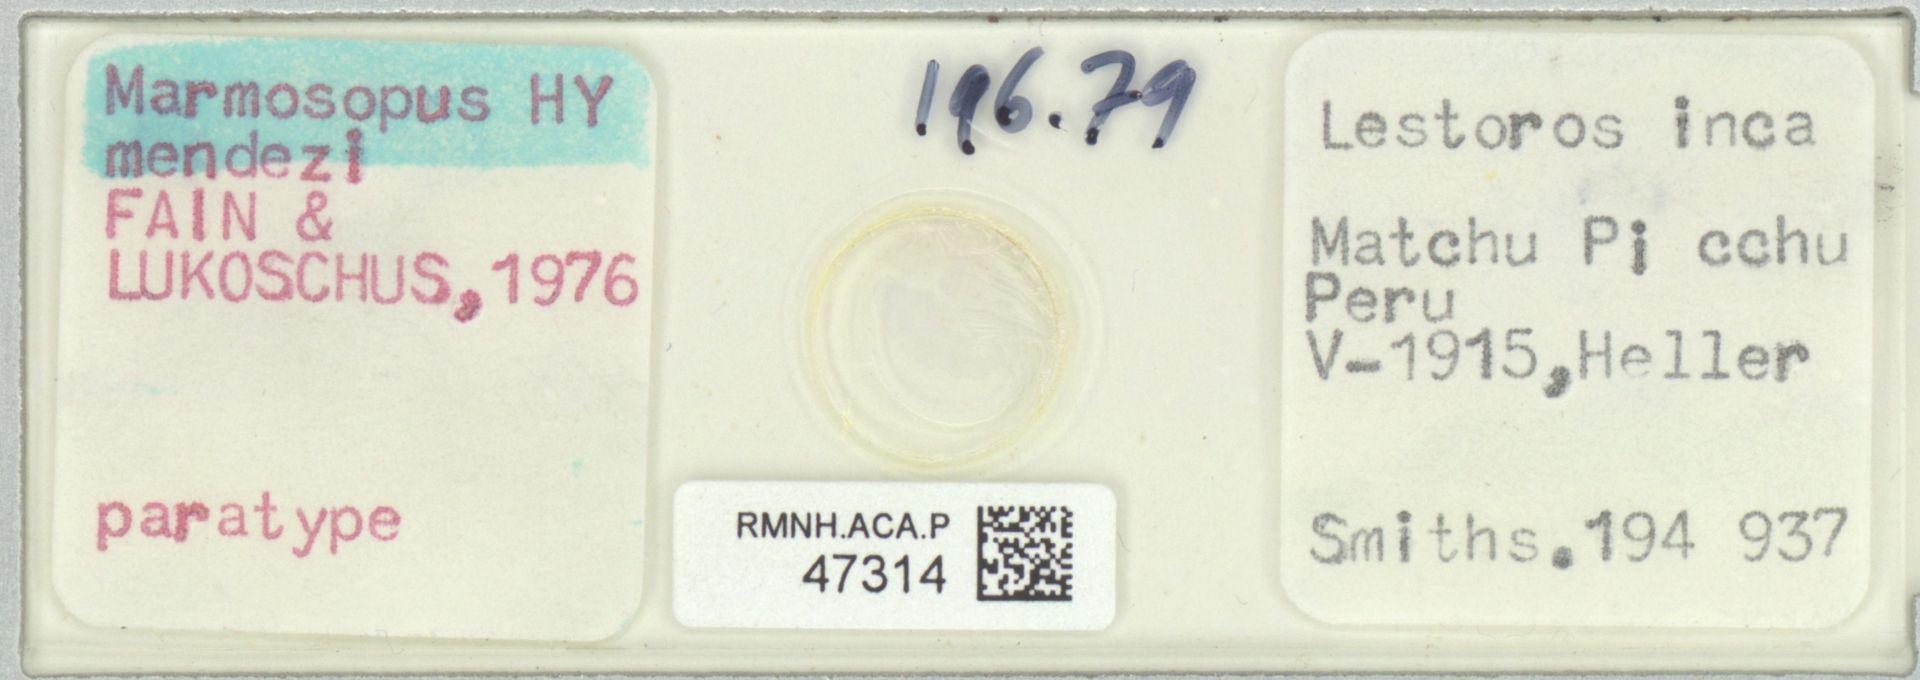 RMNH.ACA.P.47314 | Marmosopus mendezi Fain & Lukoschus,1976